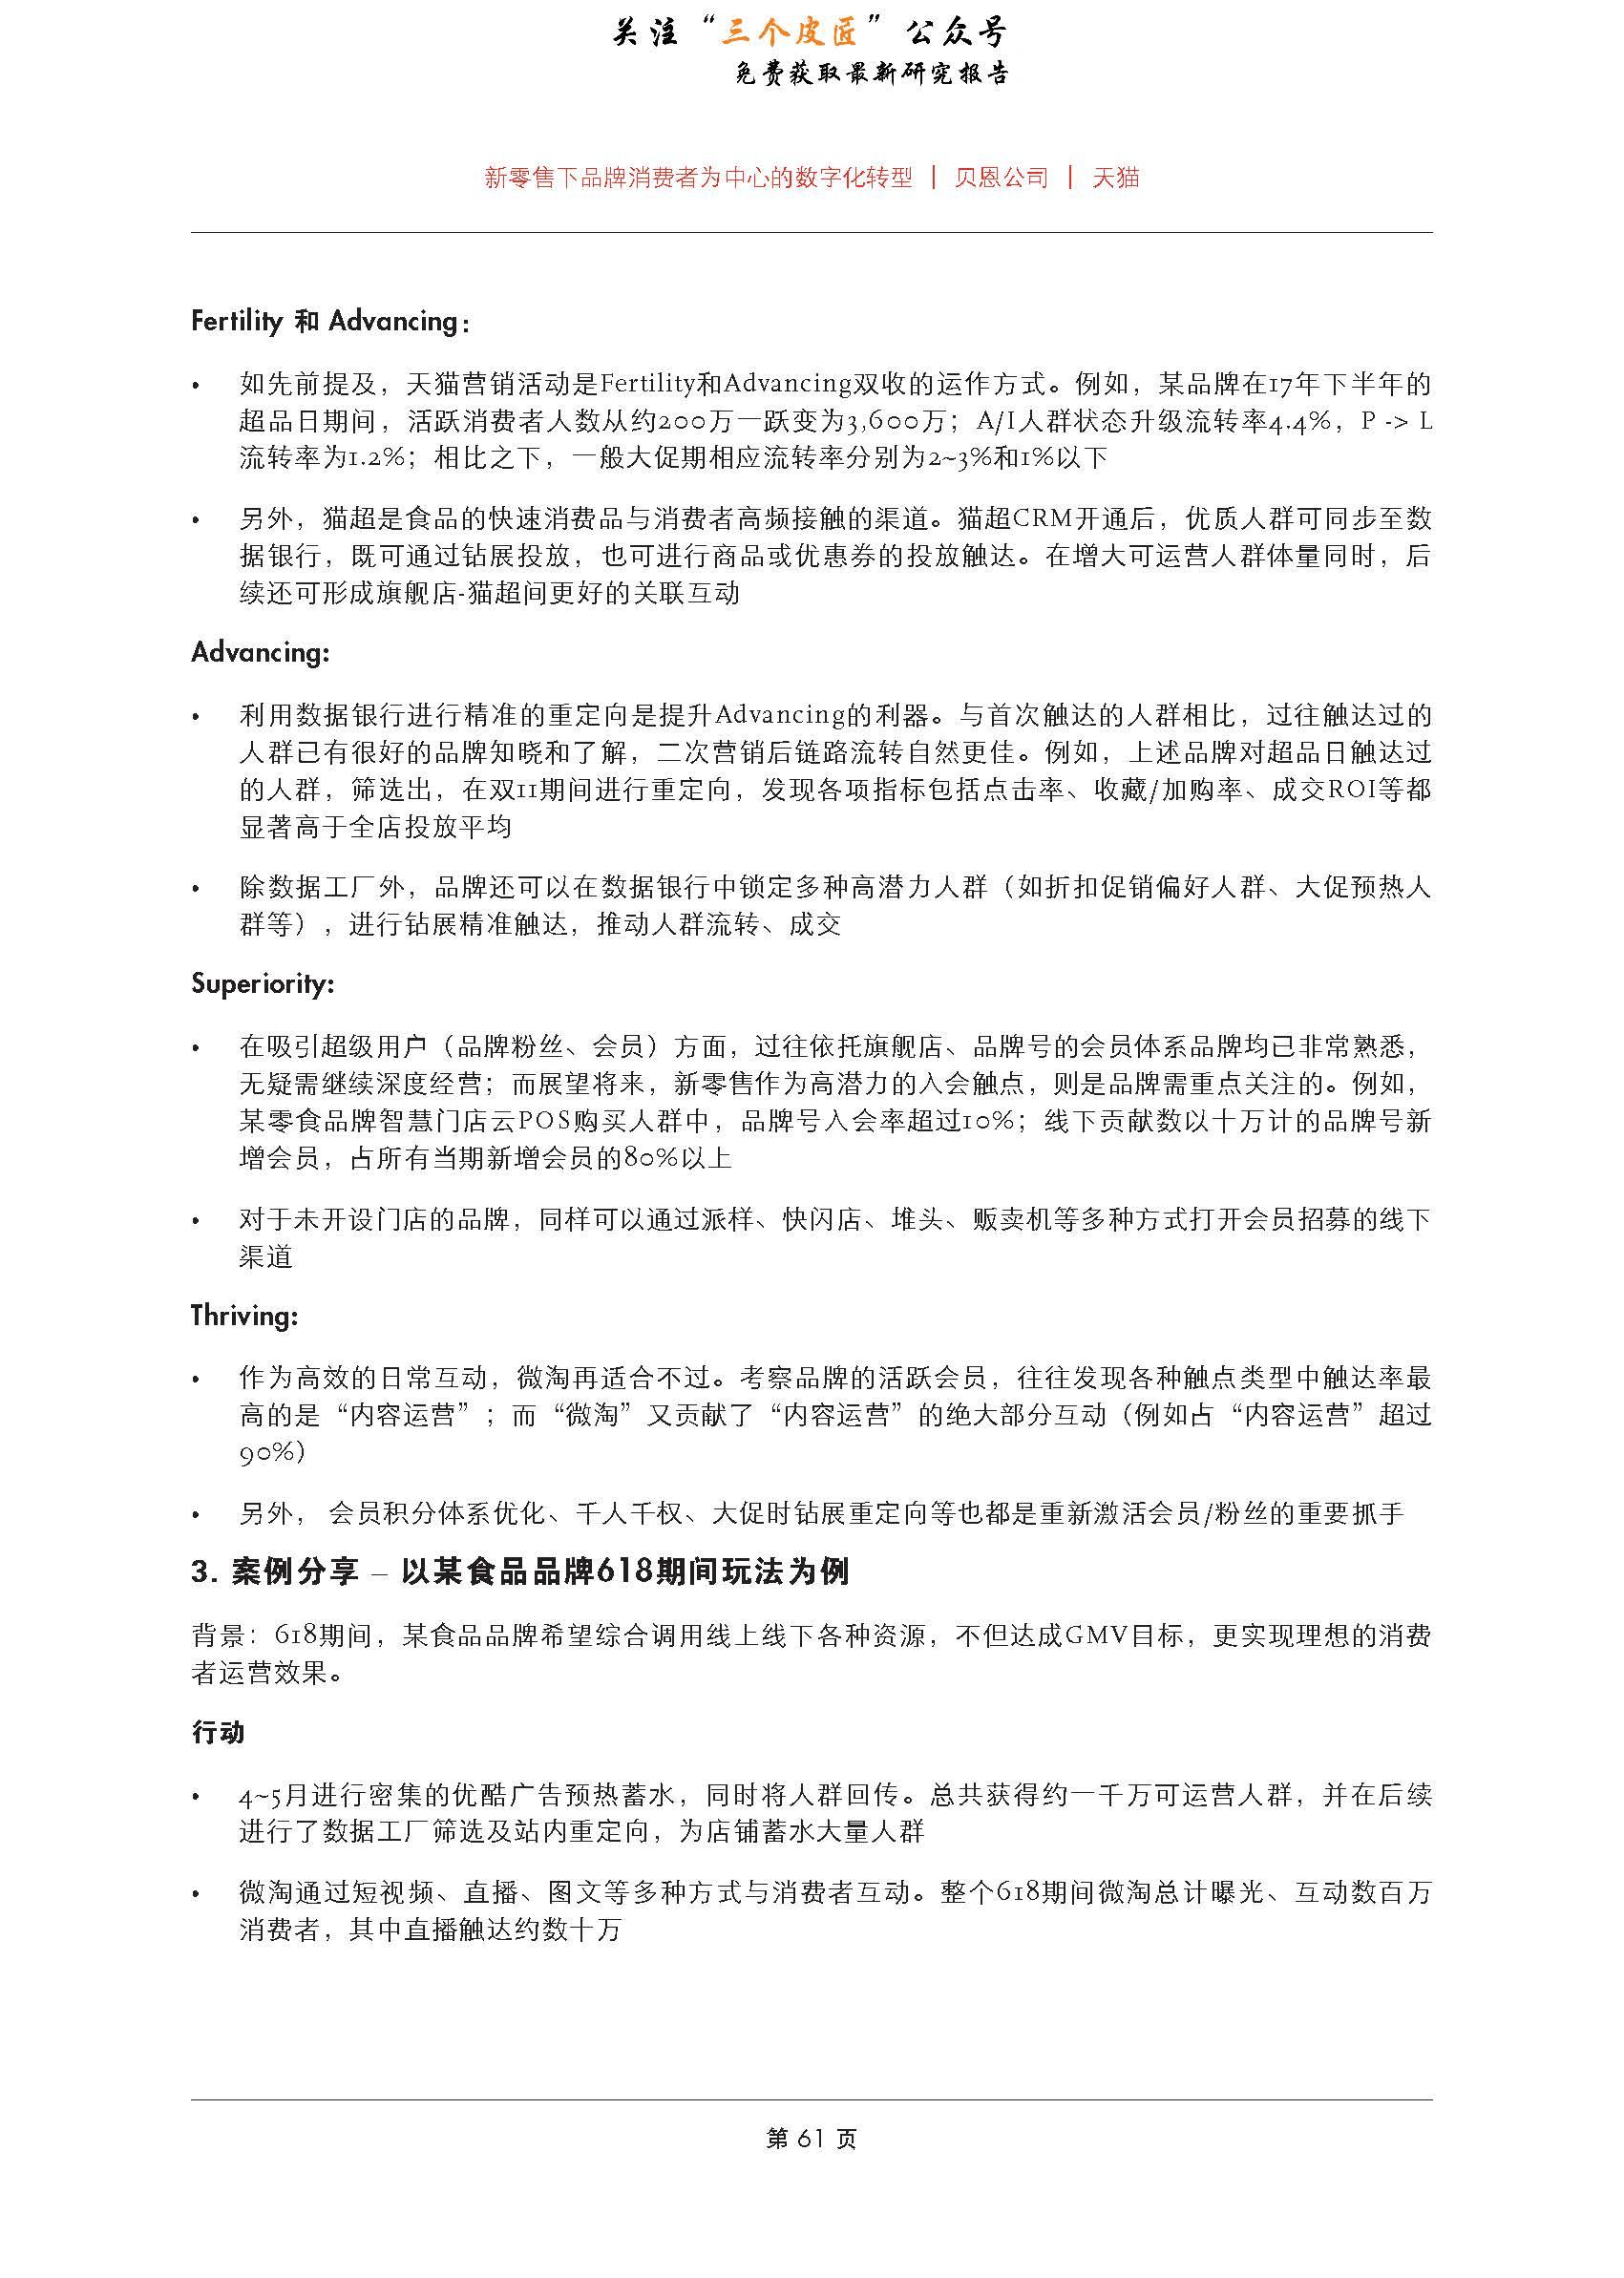 1_Page_63.jpg